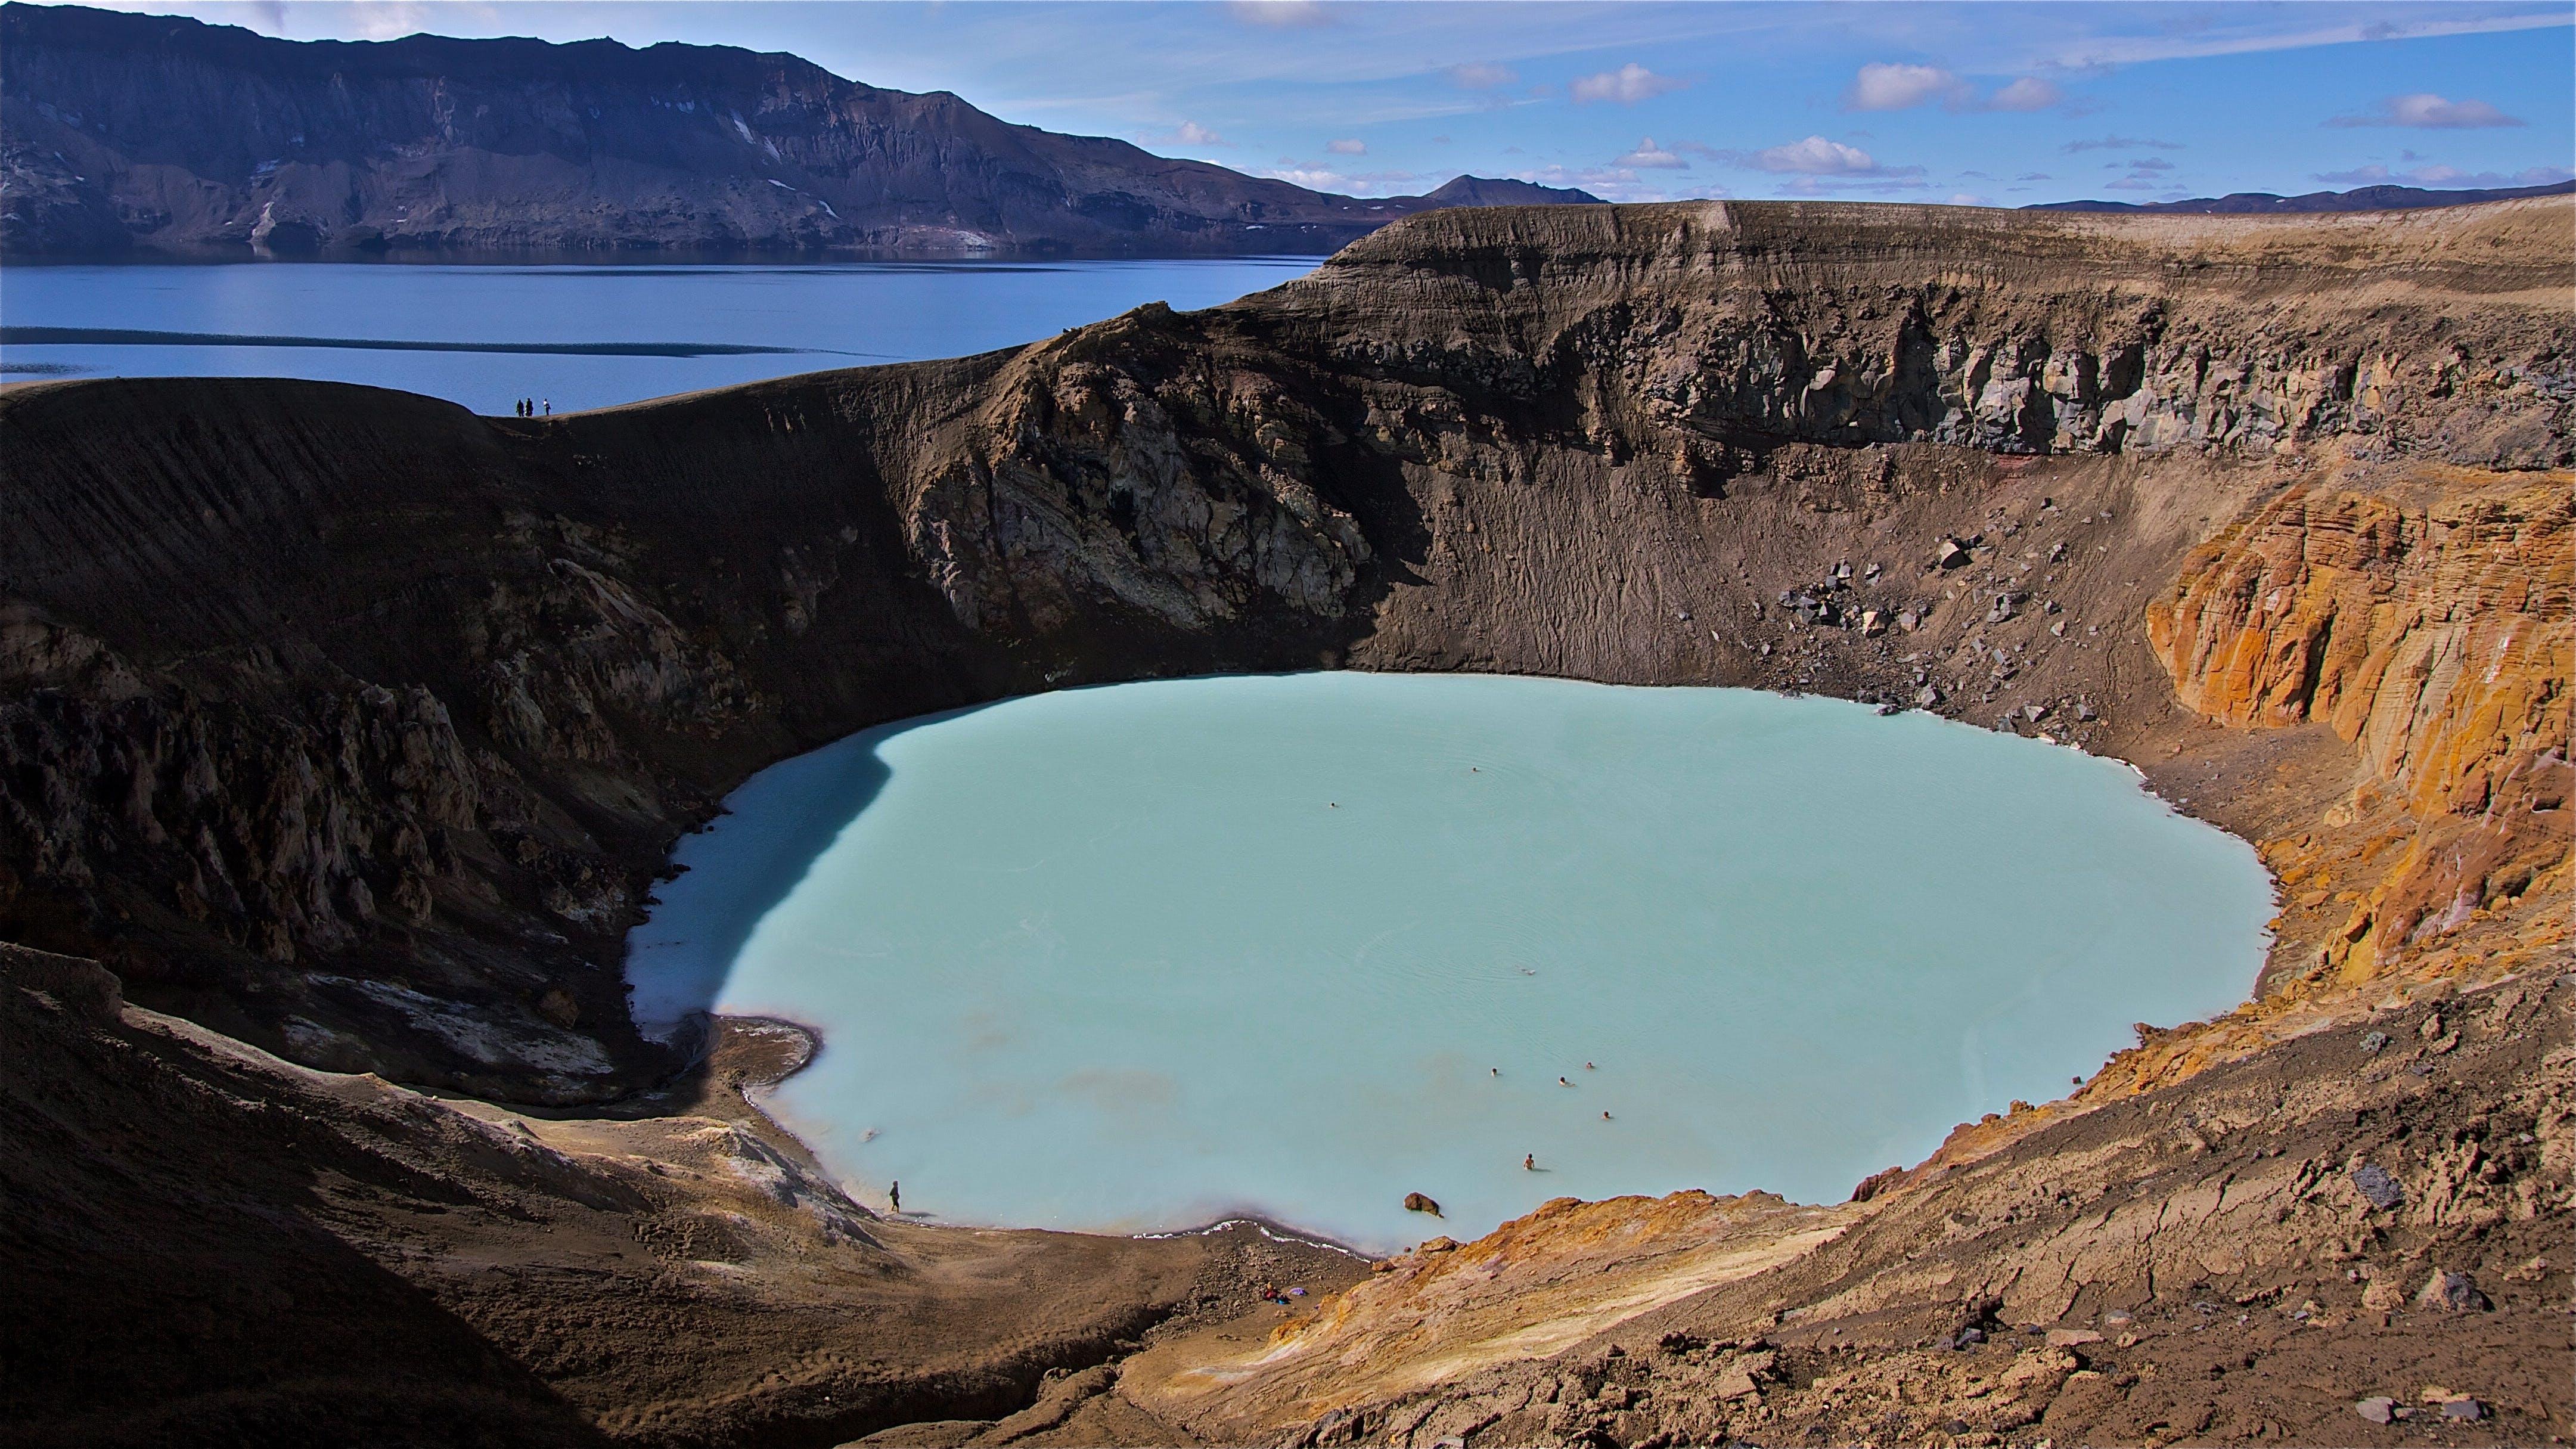 Víti hot spring in Askja by Henrik Thorburn from Wikimedia Commons